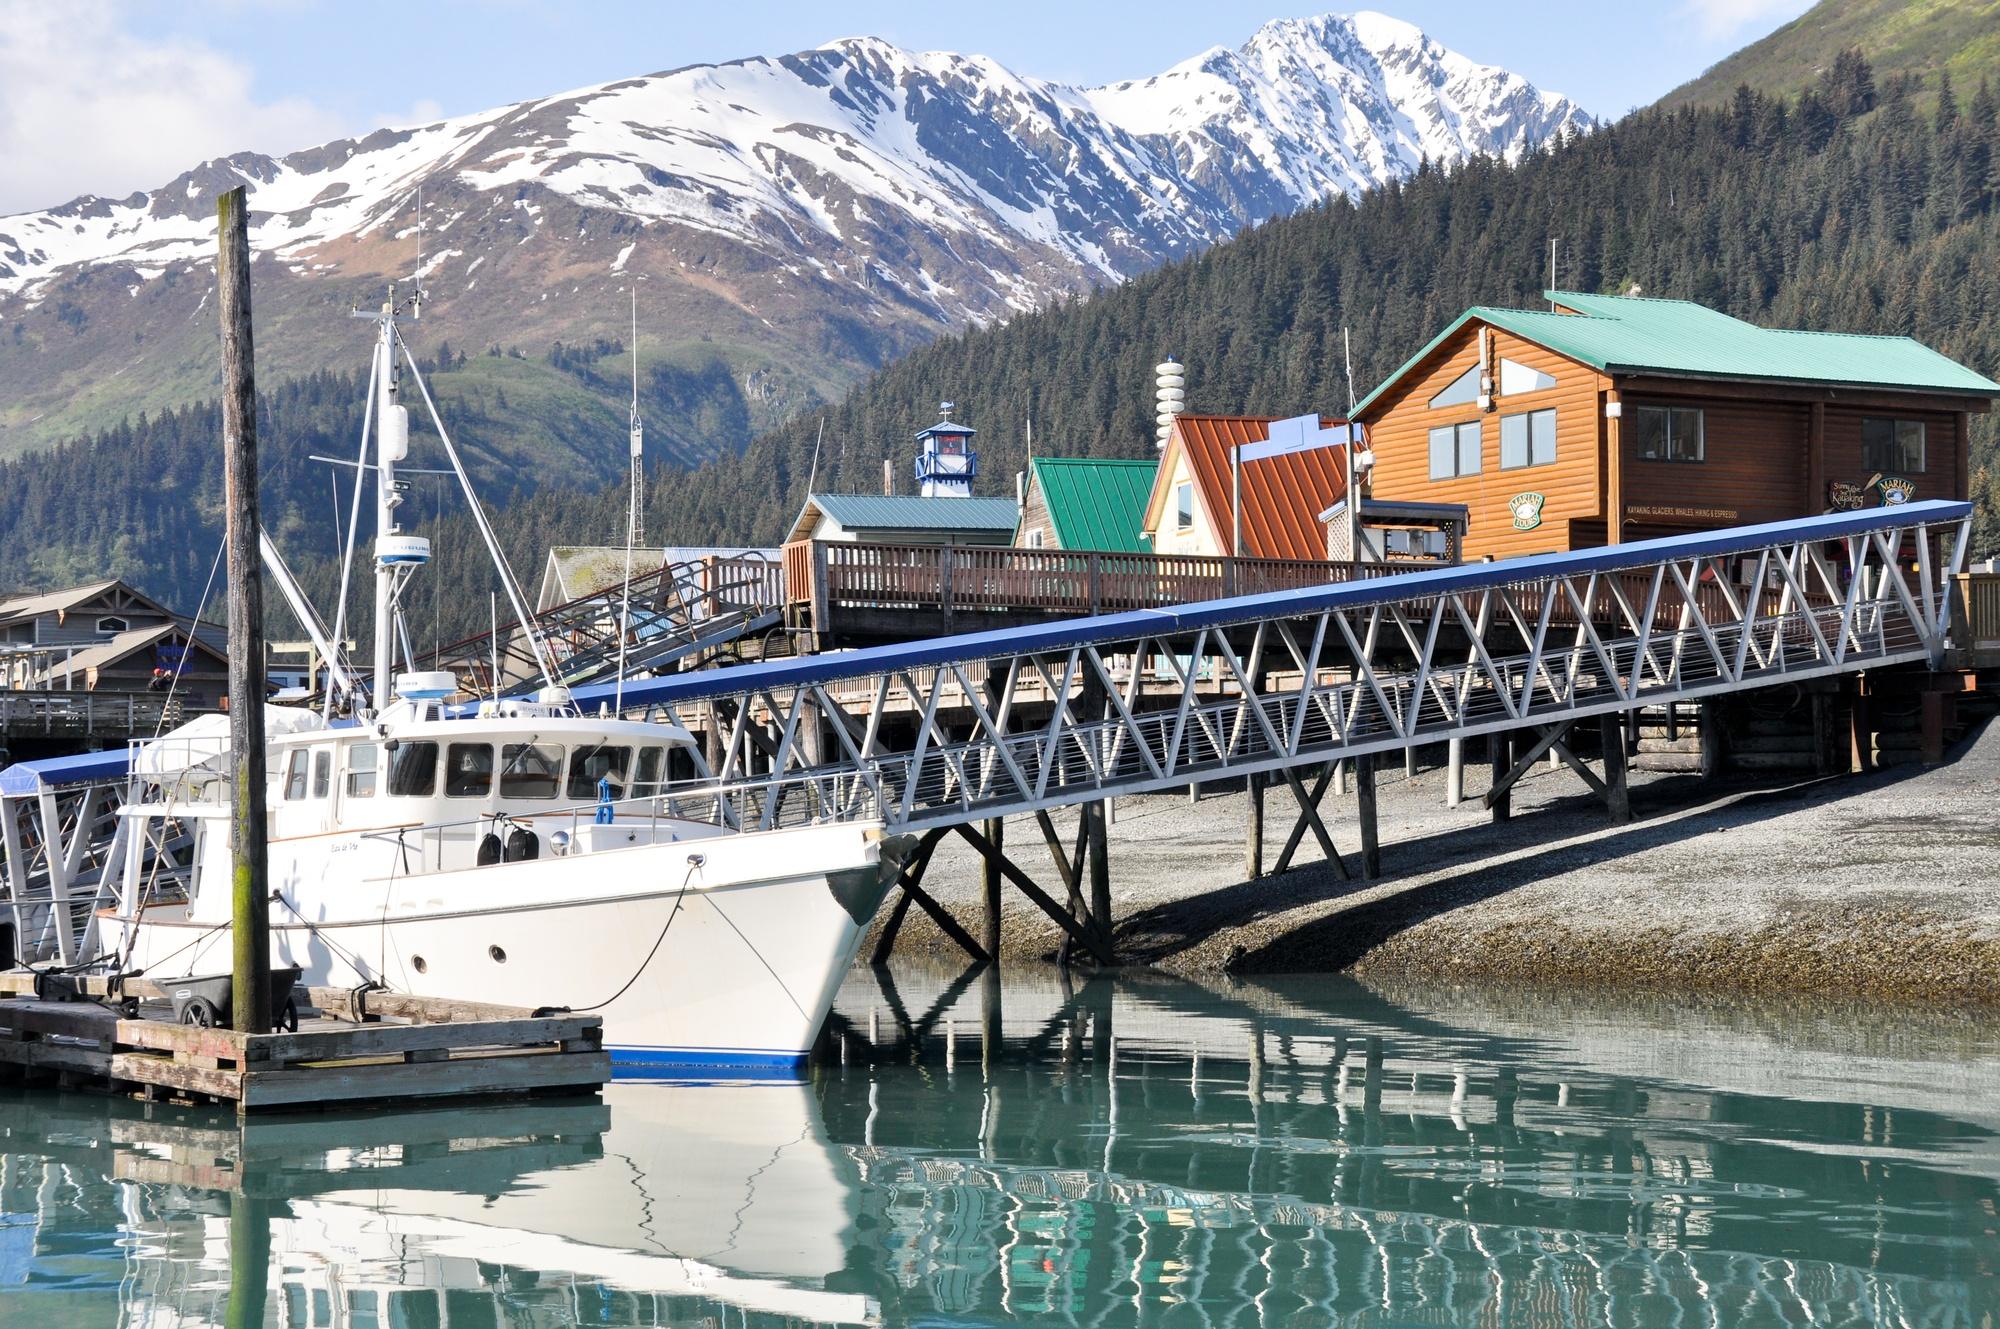 Seward, on the Western Coast of Alaska